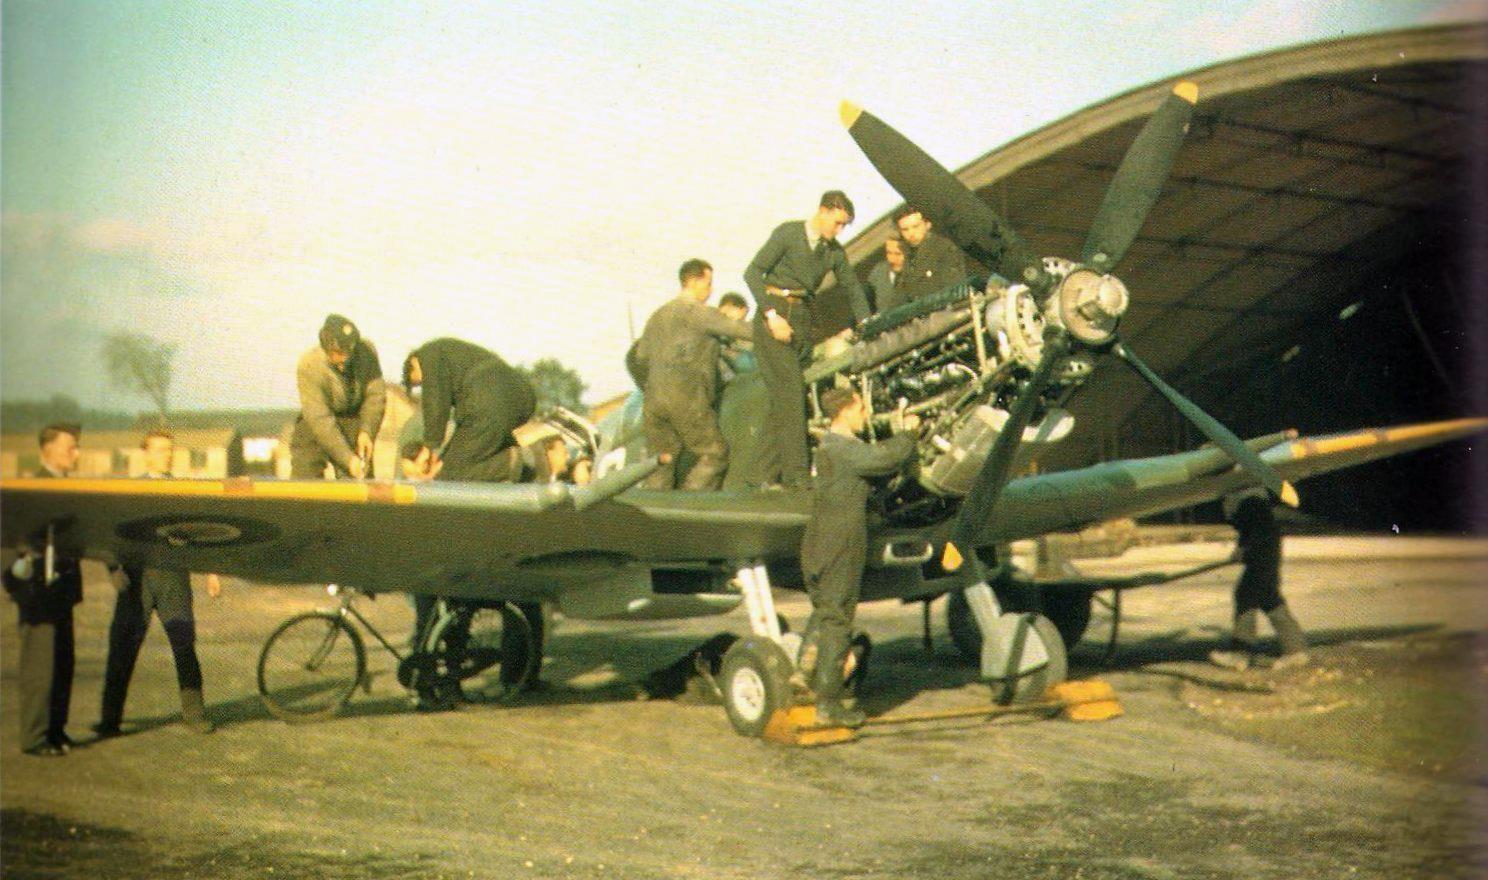 Spitfire Maintenance WWII in photos Pinterest